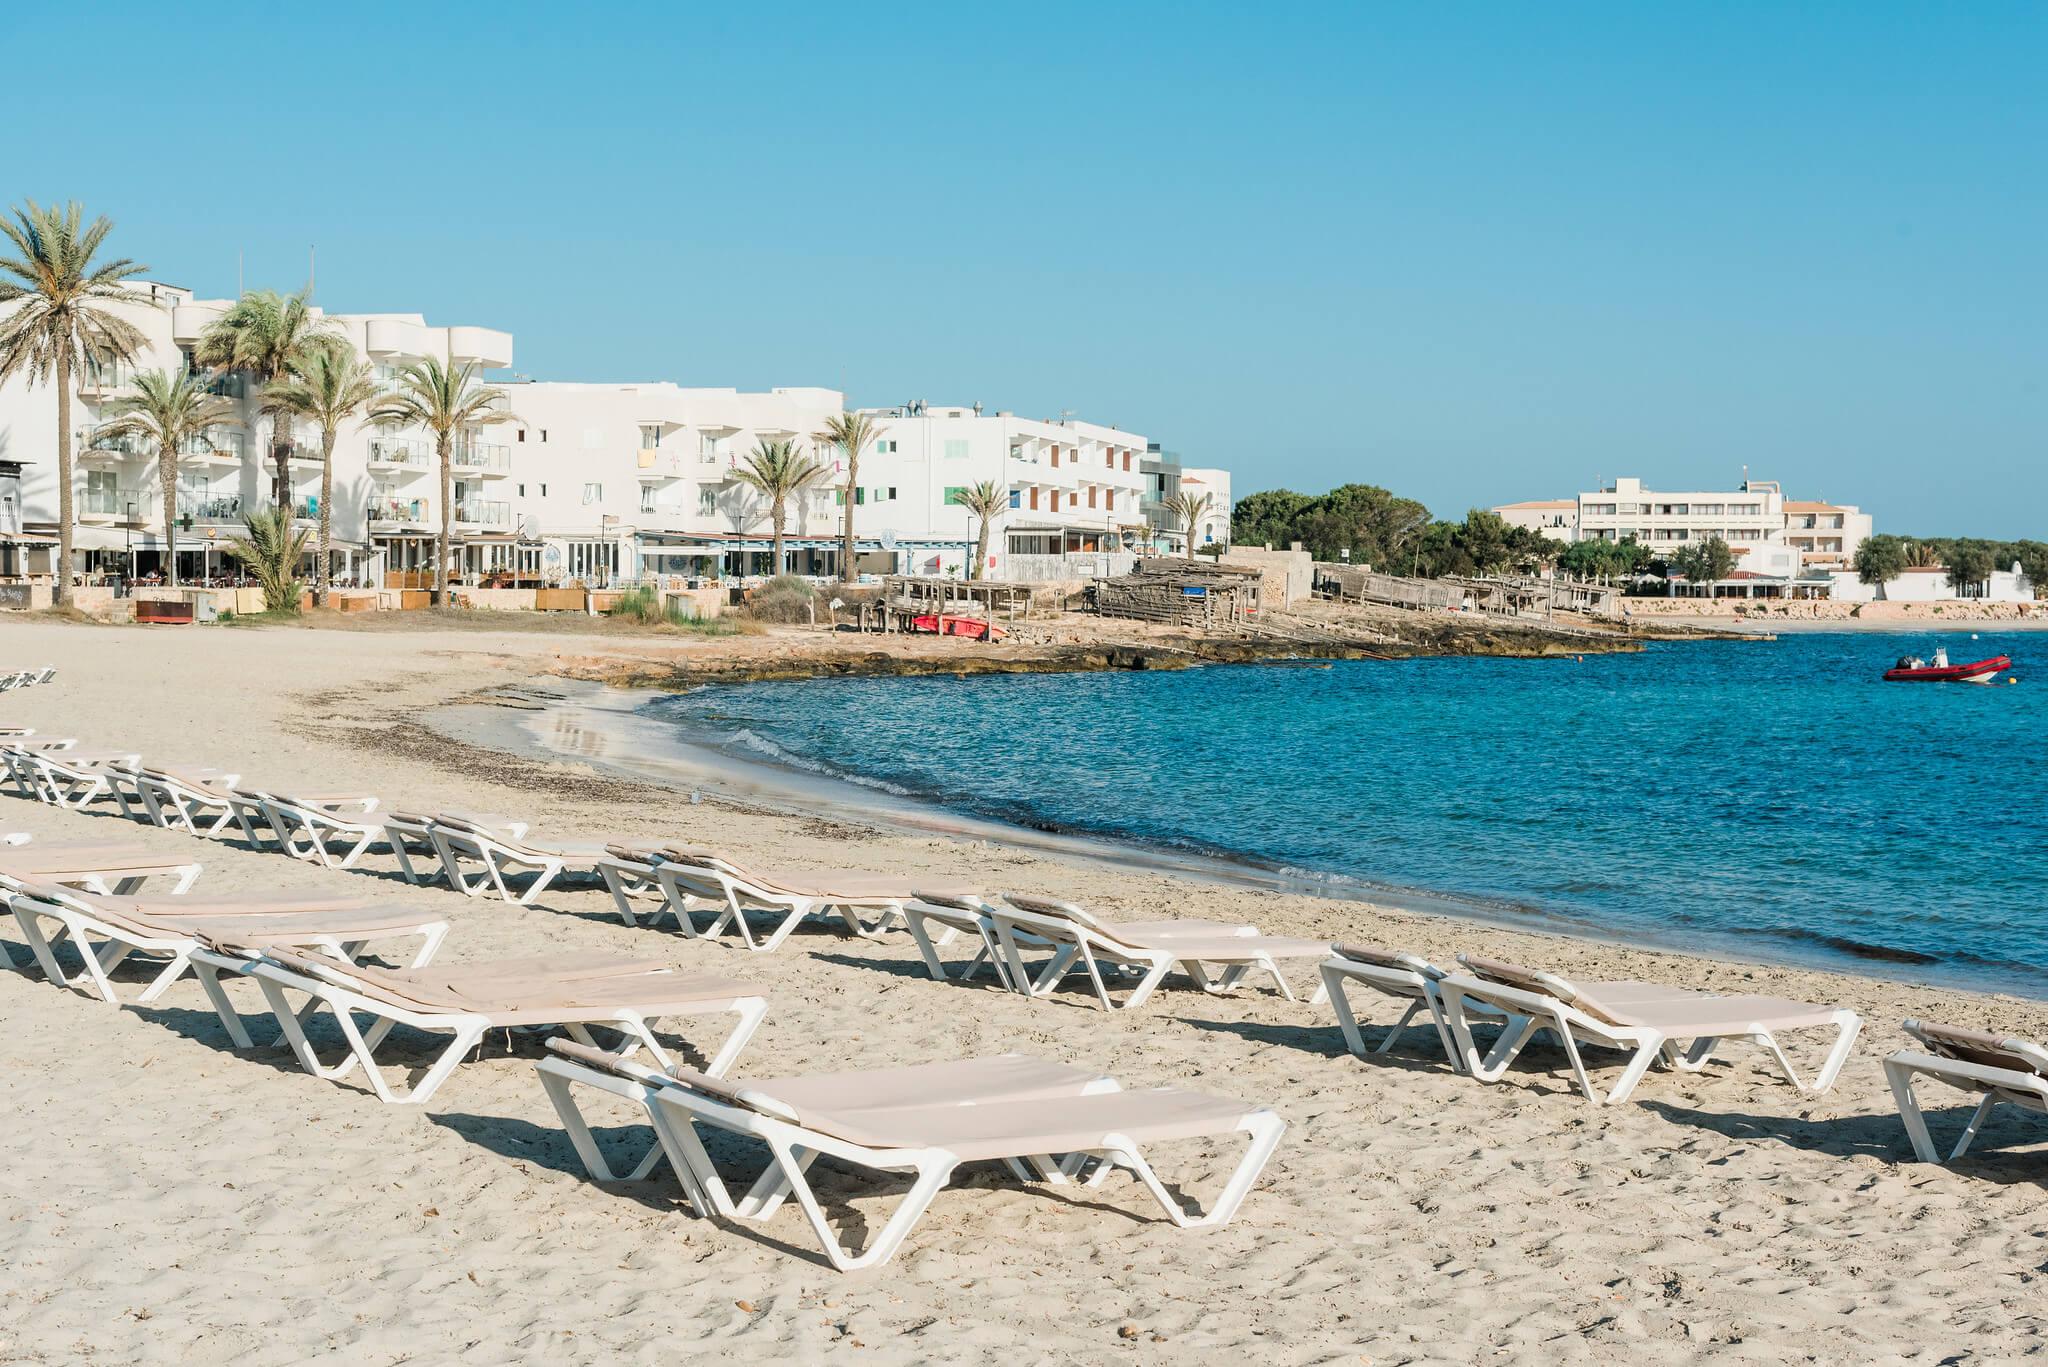 https://www.white-ibiza.com/wp-content/uploads/2020/03/formentera-beaches-es-pujols-2020-04.jpg